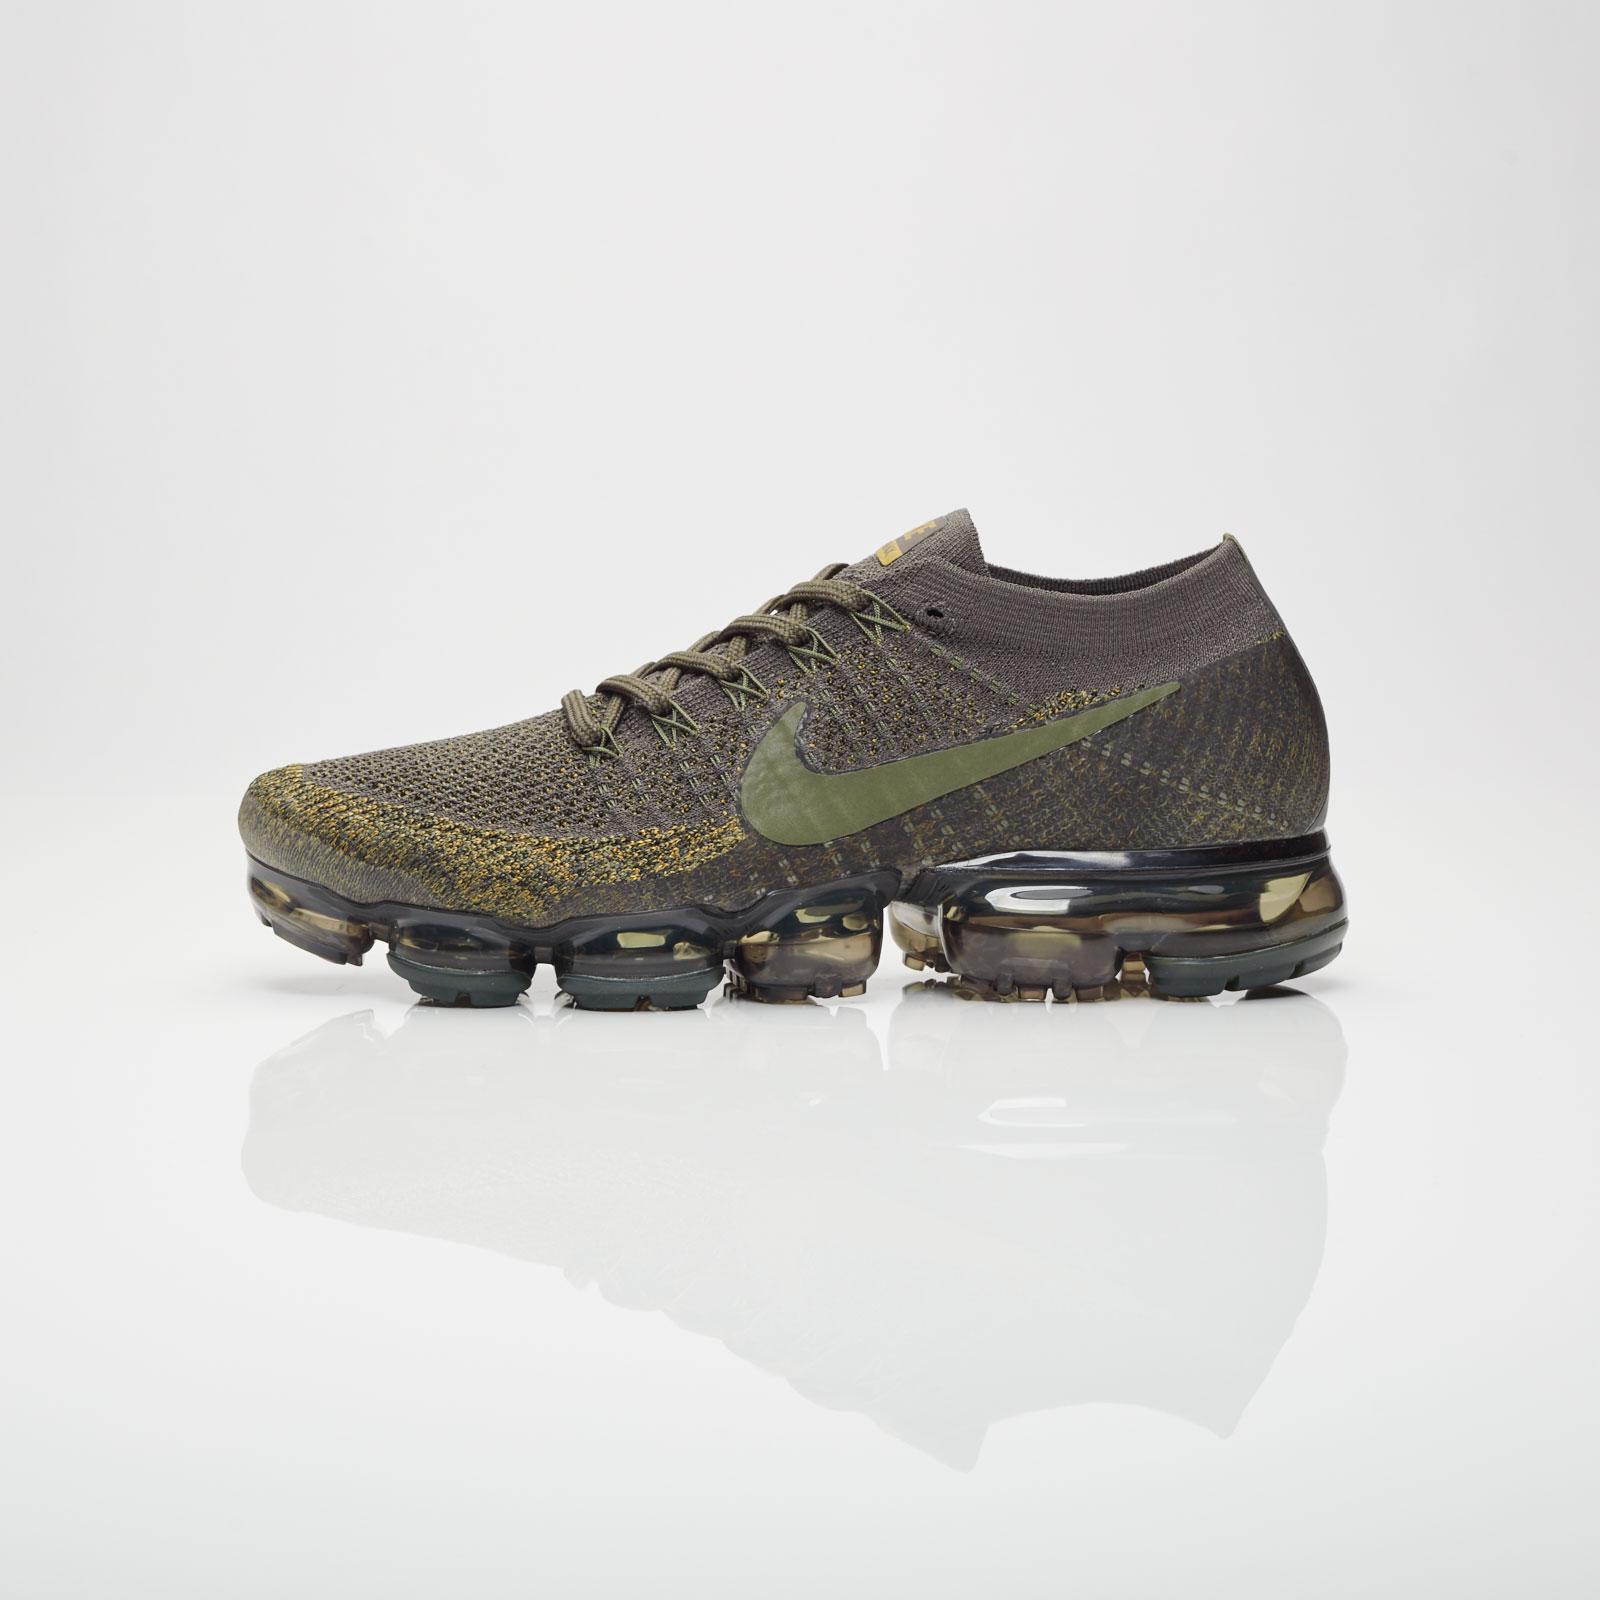 3b14e4a8b6f Nike Air Vapormax Flyknit - 899473-004 - Sneakersnstuff